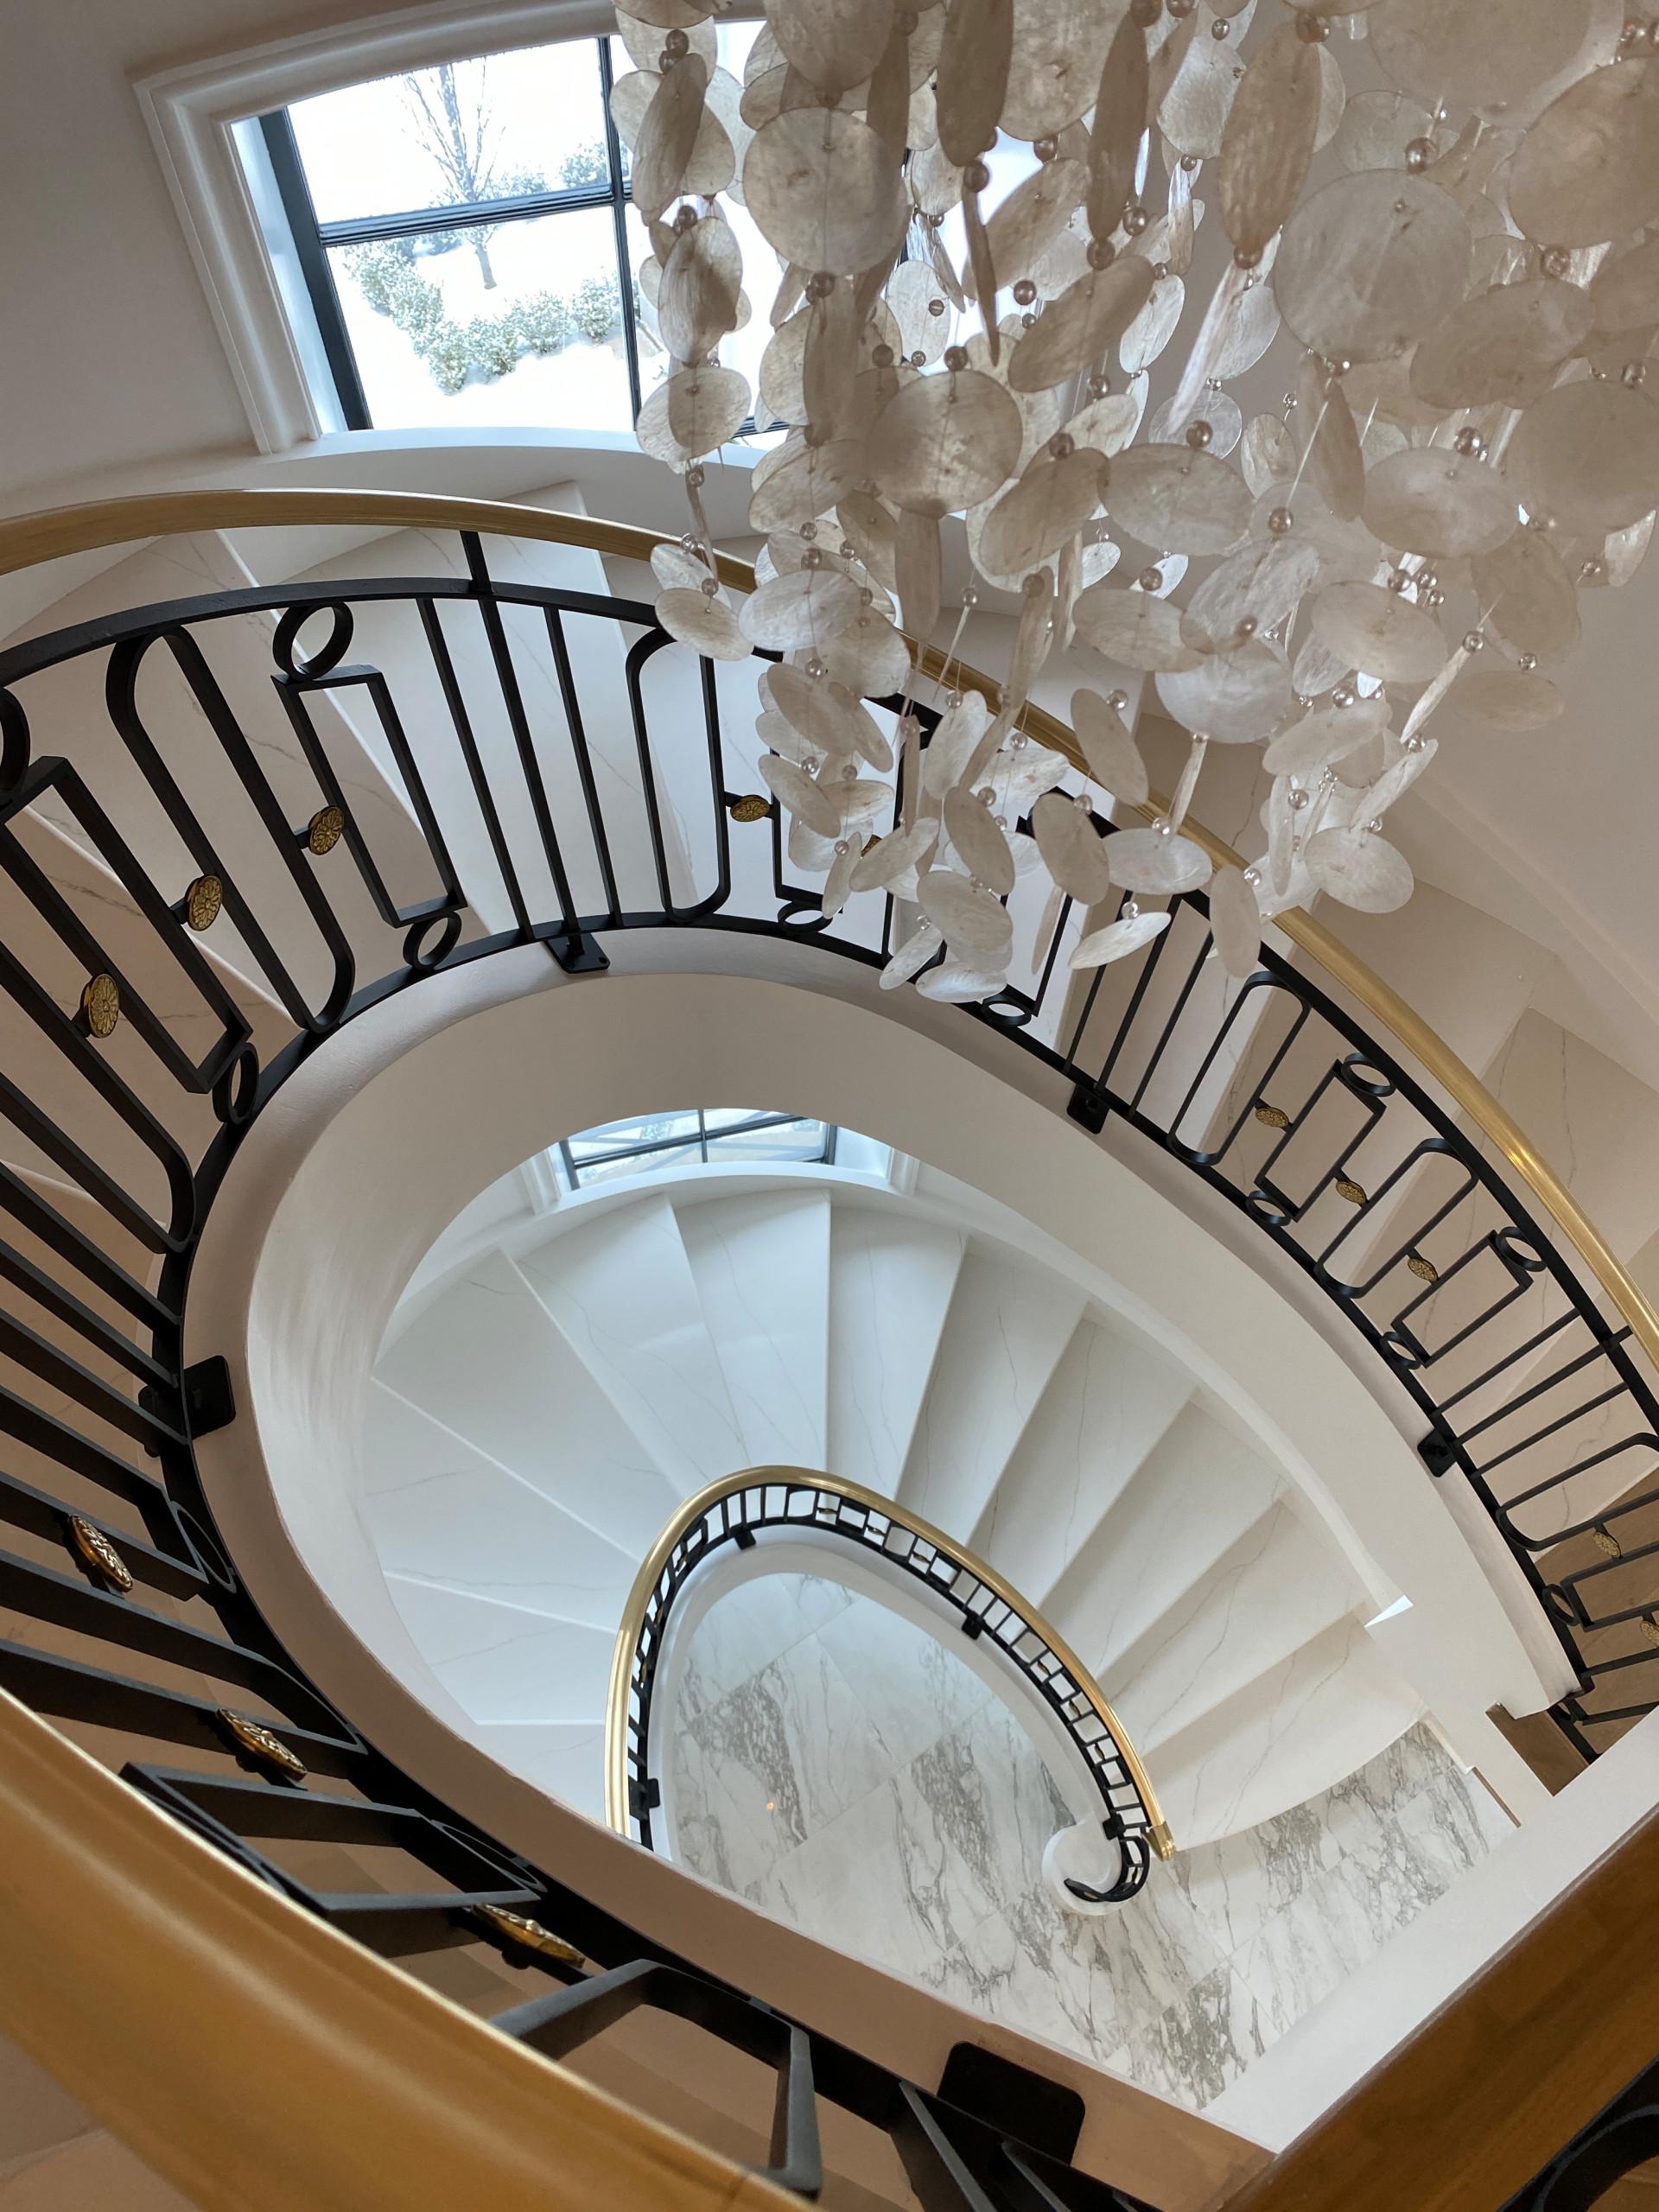 Glencoe - Historic Mansion Restoration